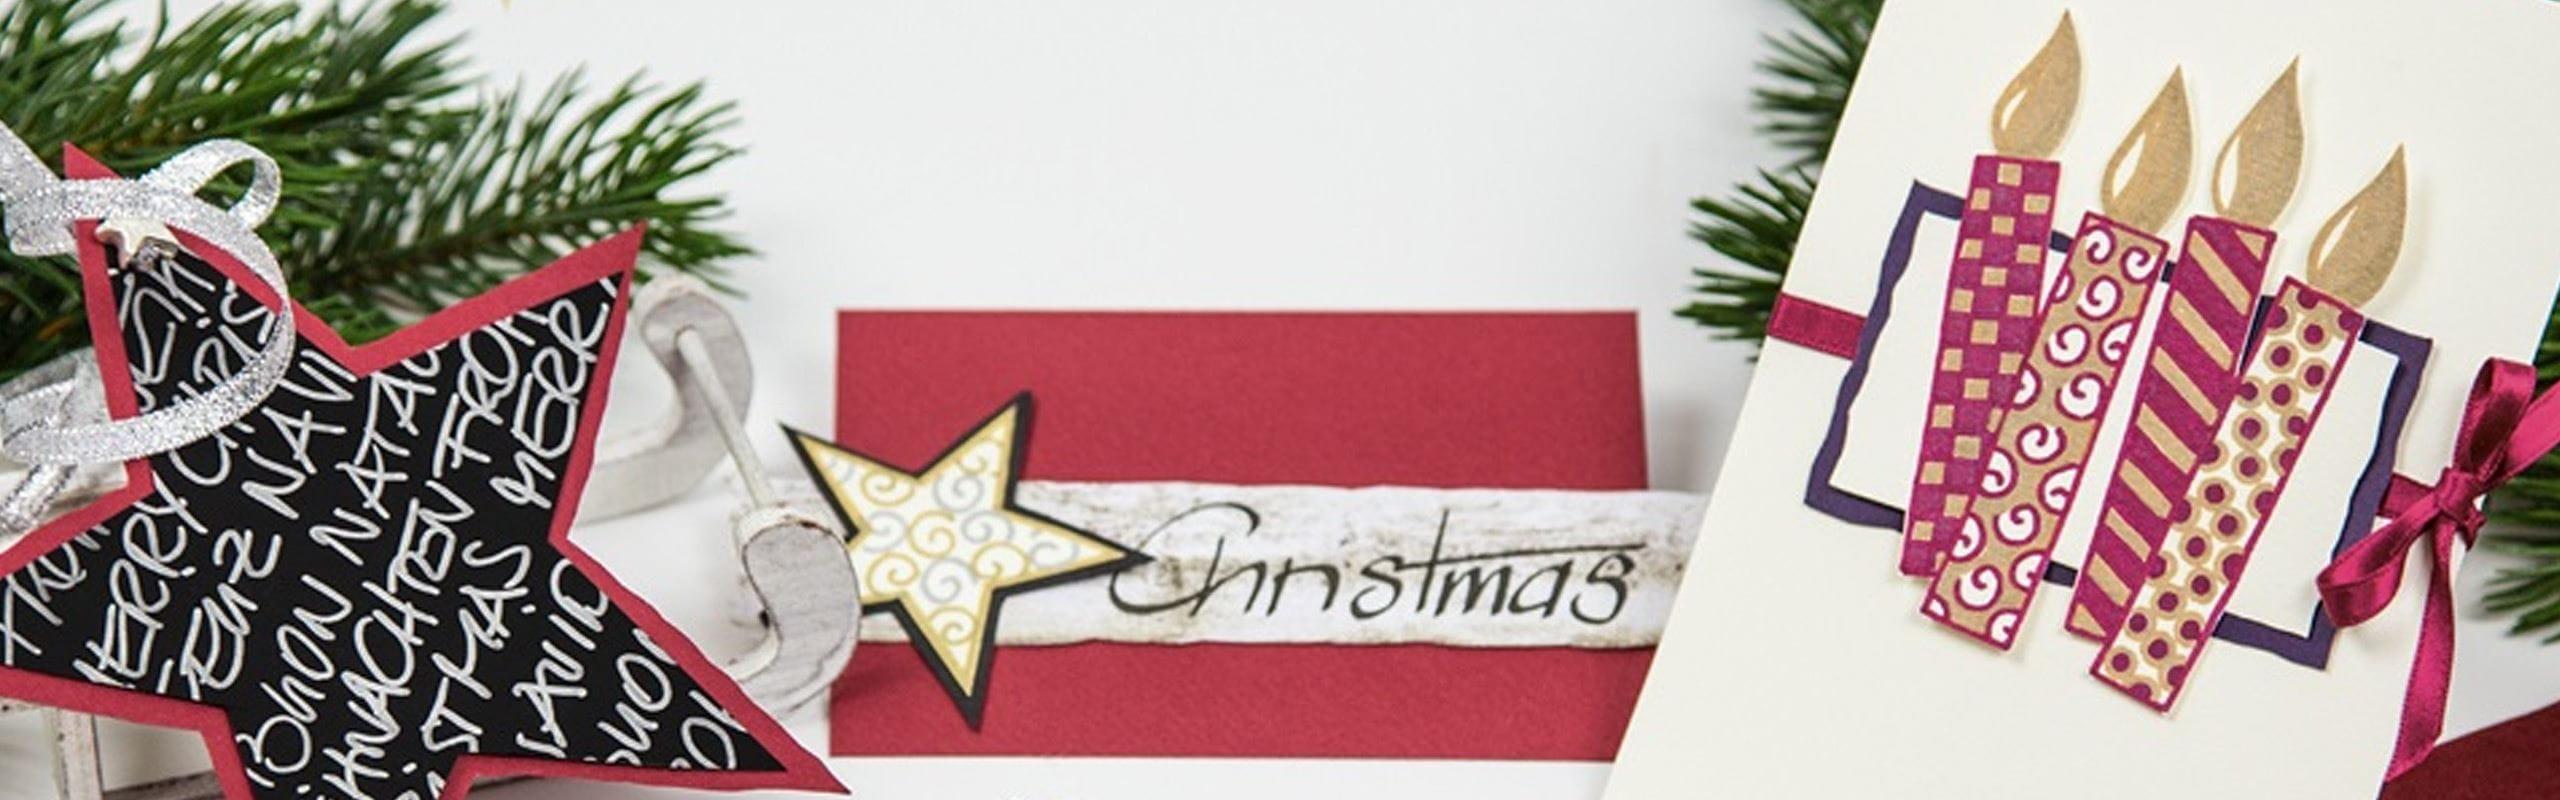 kreative ideen zu weihnachten mit dem pitt artist pen metallic. Black Bedroom Furniture Sets. Home Design Ideas